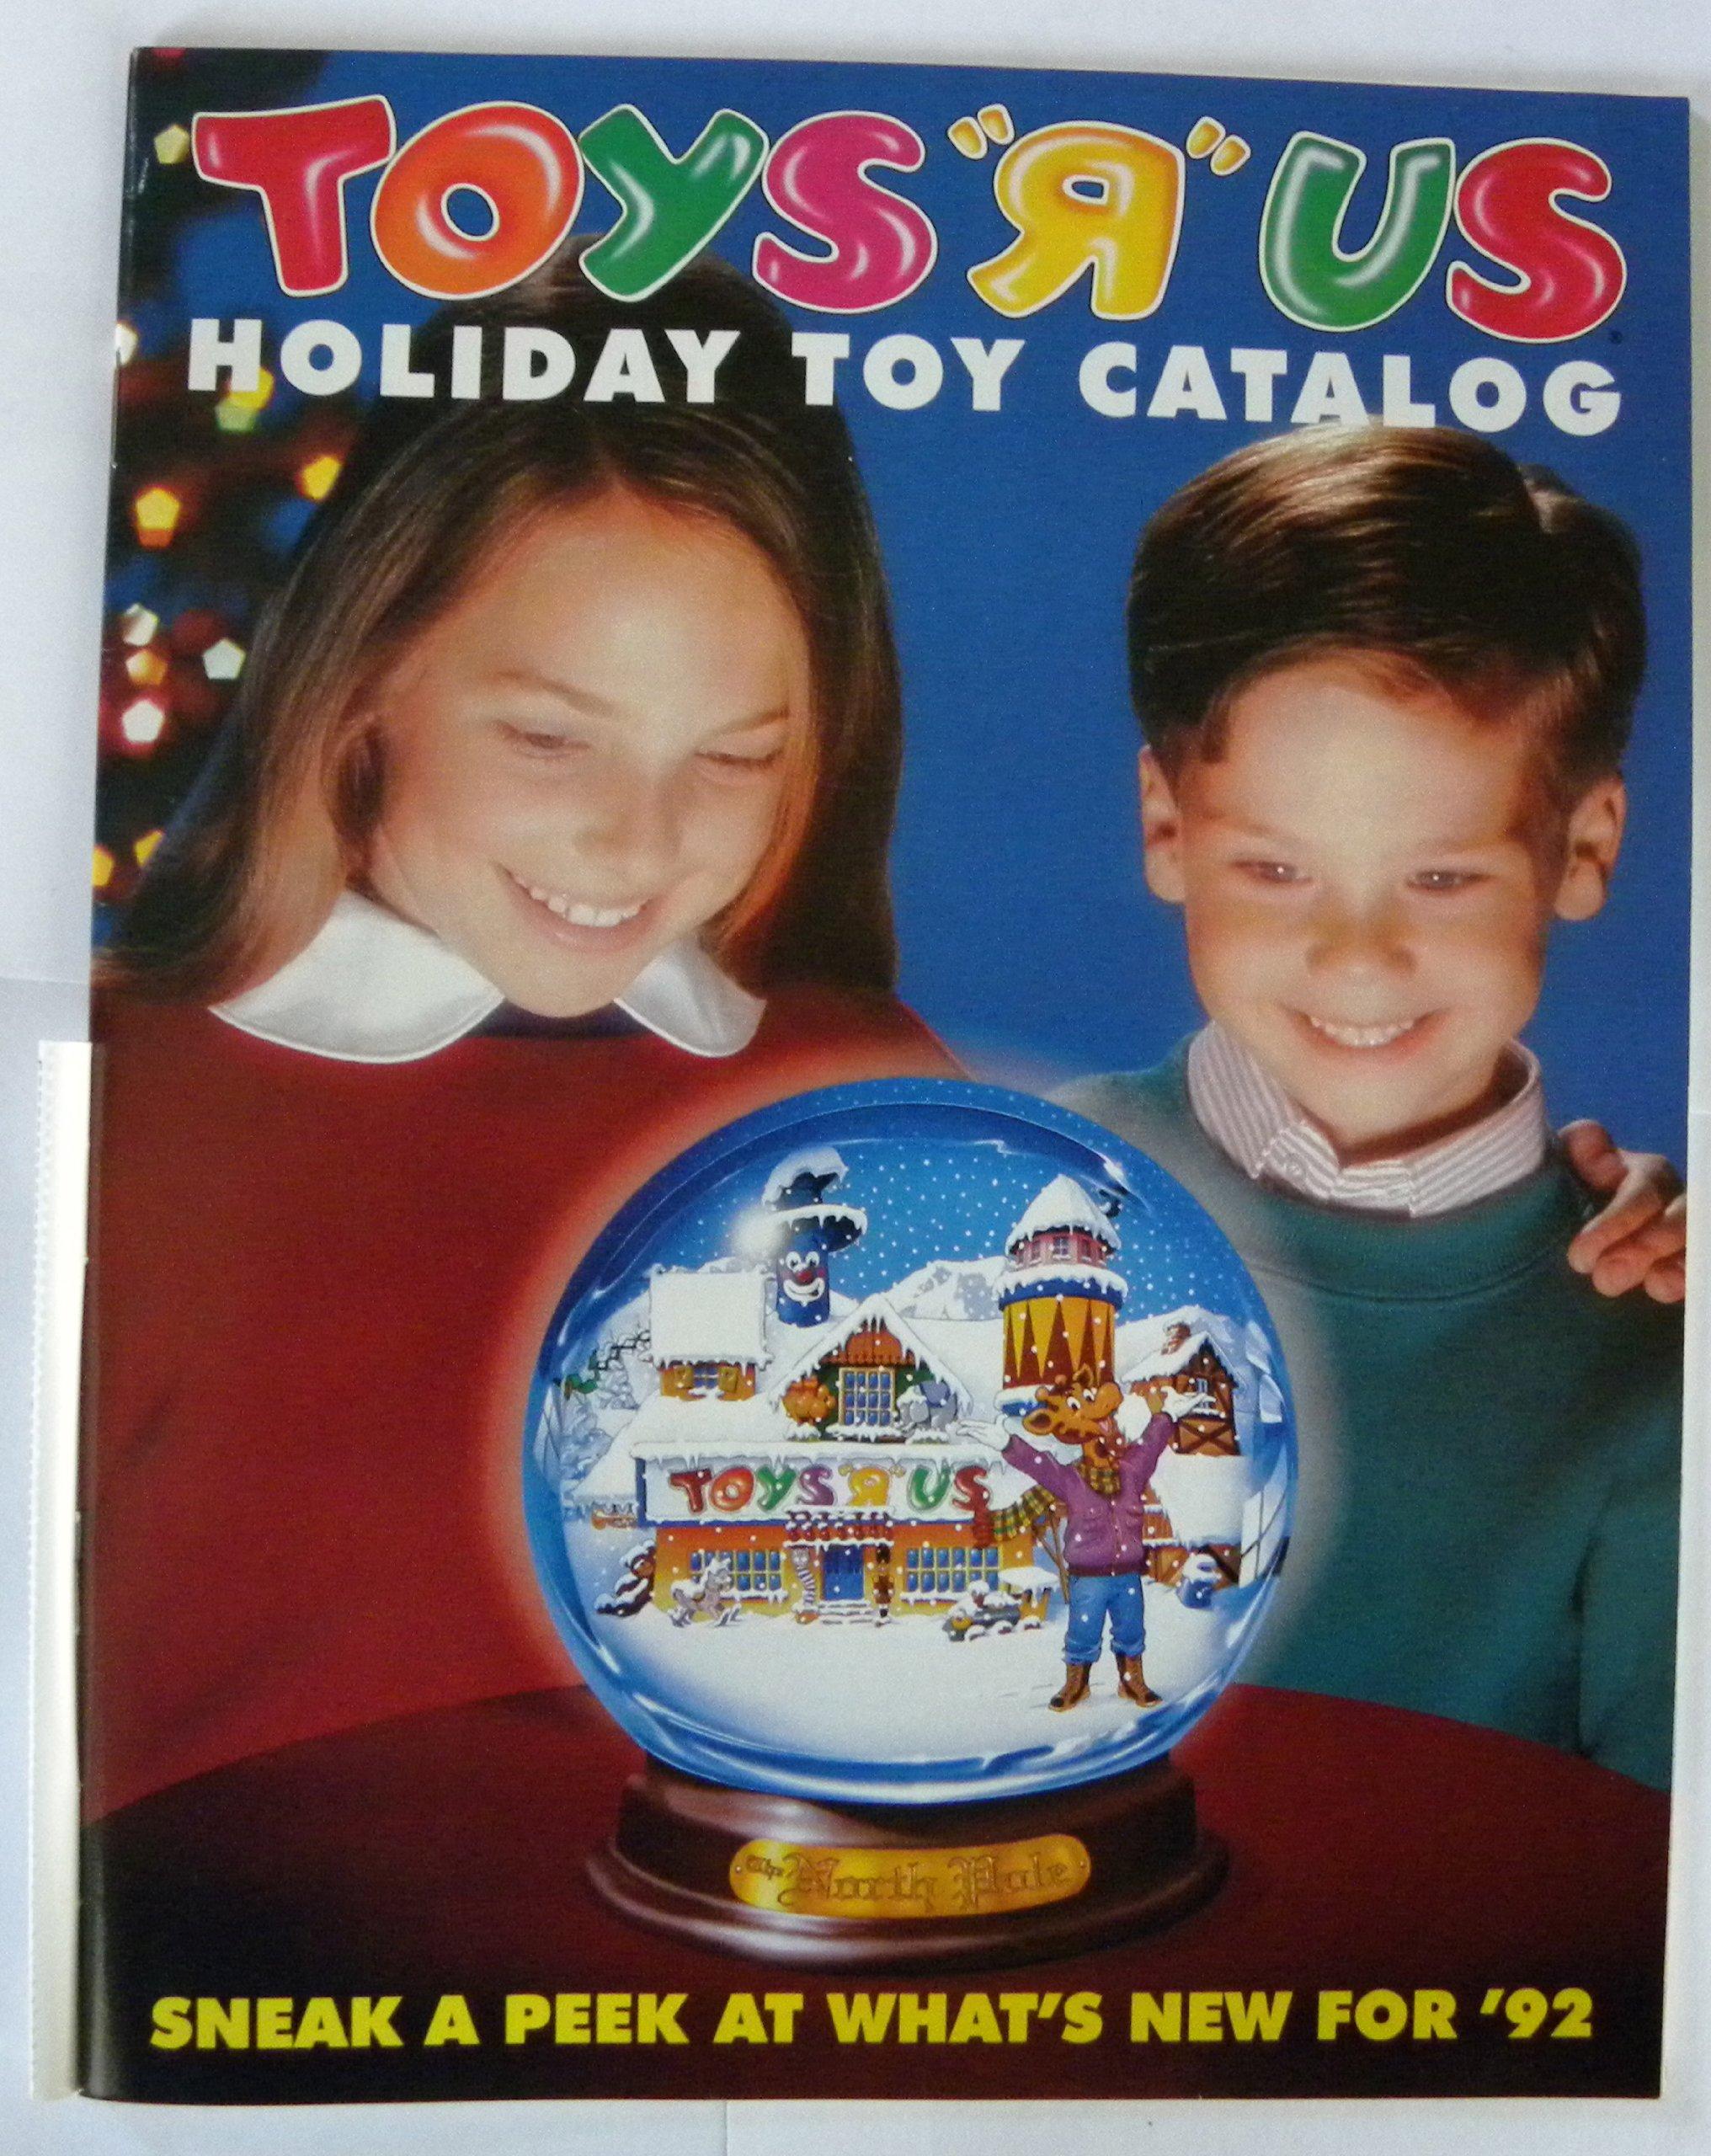 Toys R Us Holiday Toy Catalog 1992 Amazon Com Books